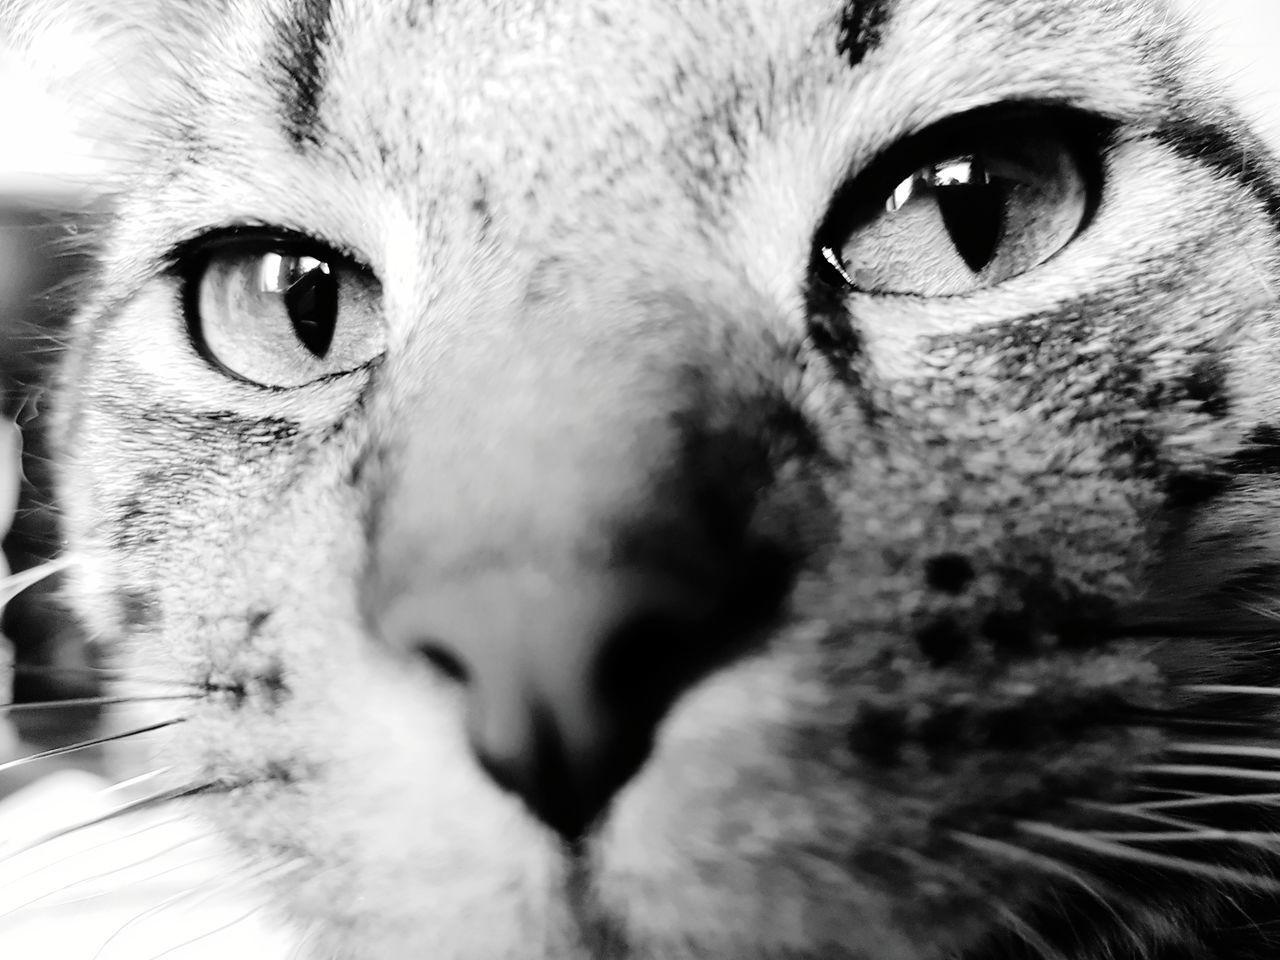 Looking At Camera Domestic Cat Pets Portrait Eye Animal Eye Animal Body Part One Animal Feline Close-up Animal Head  Domestic Animals Animal Themes Mammal Human Eye Iris - Eye Eyesight Yellow Eyes Indoors  Day Cat♡ Cat Lovers Cats Of EyeEm Cateyes Cats